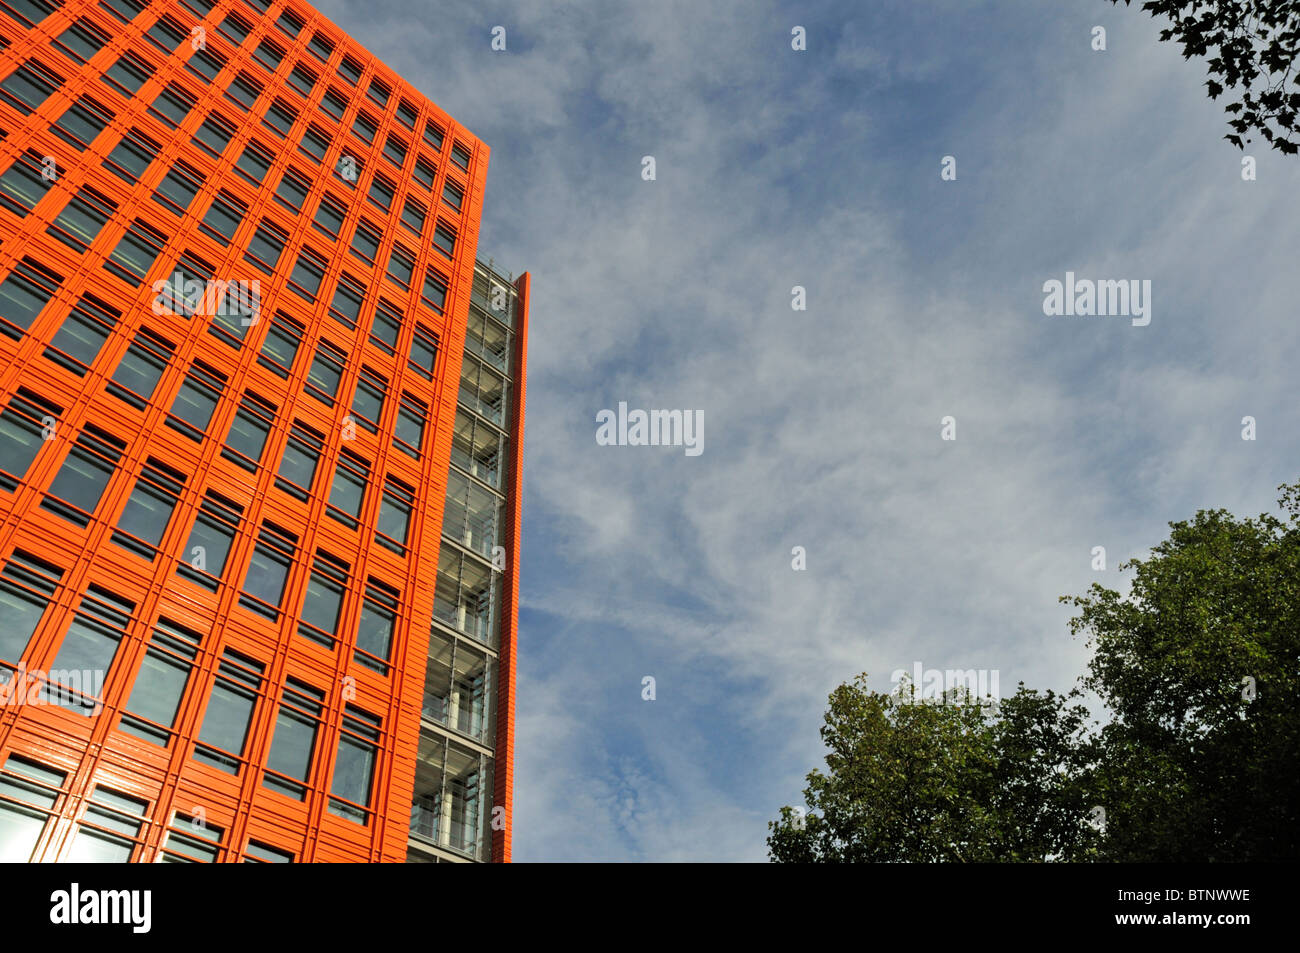 Central St Giles, Saint Giles High Street, High Holborn, London, United Kingdom - Stock Image